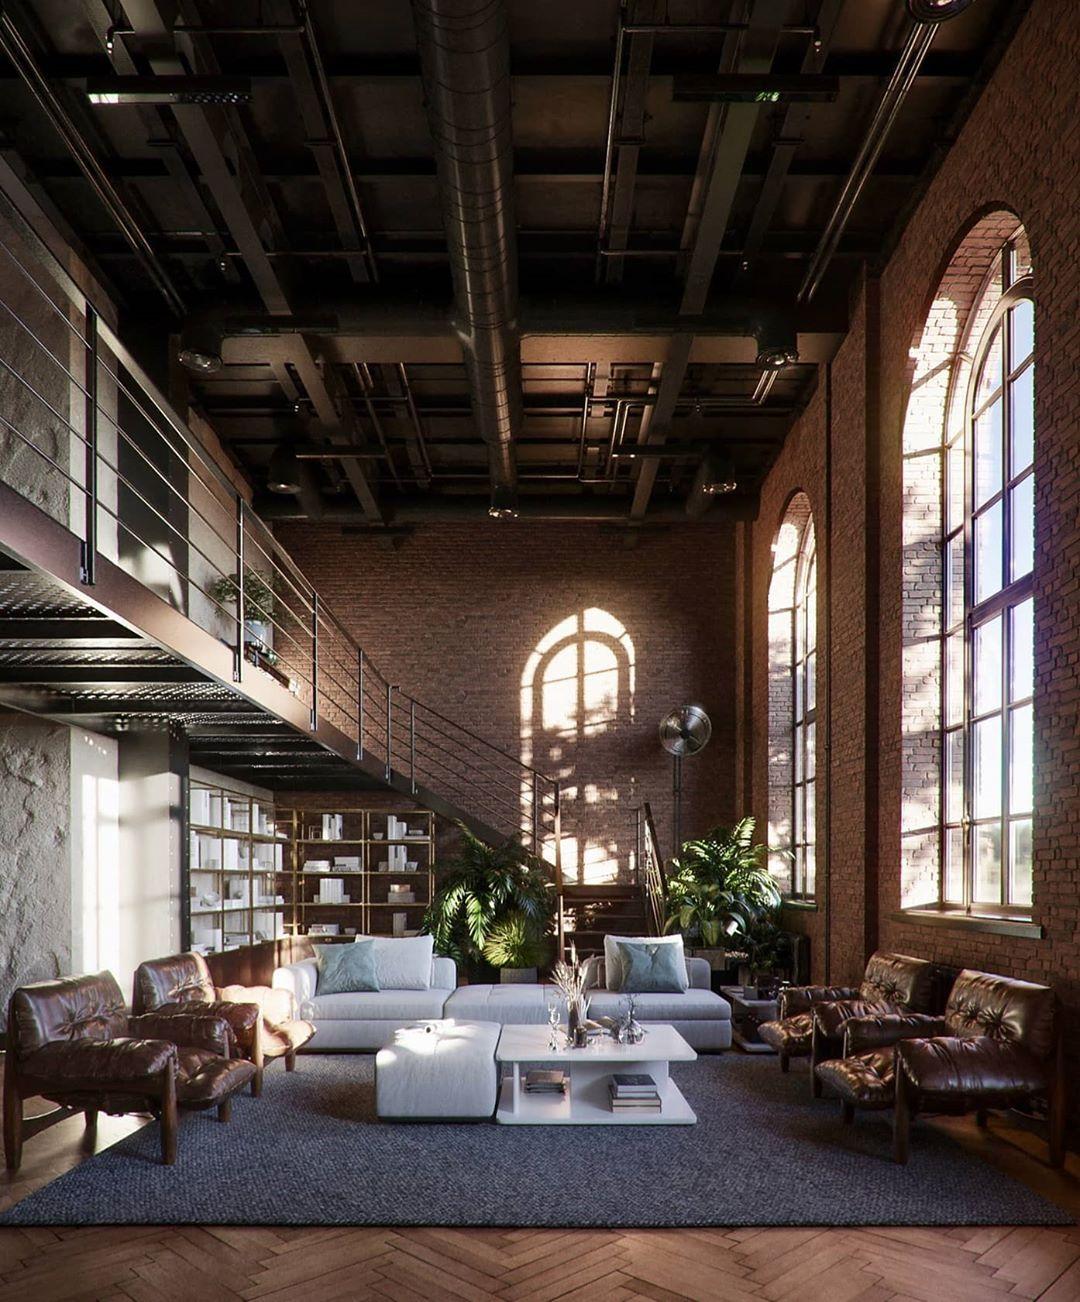 Arch Oskar On Instagram Industrial New York Inspired Penthouse Archoskar The Industrial Penthouse In 2020 Industrial Loft Design Loft Design Architecture Design